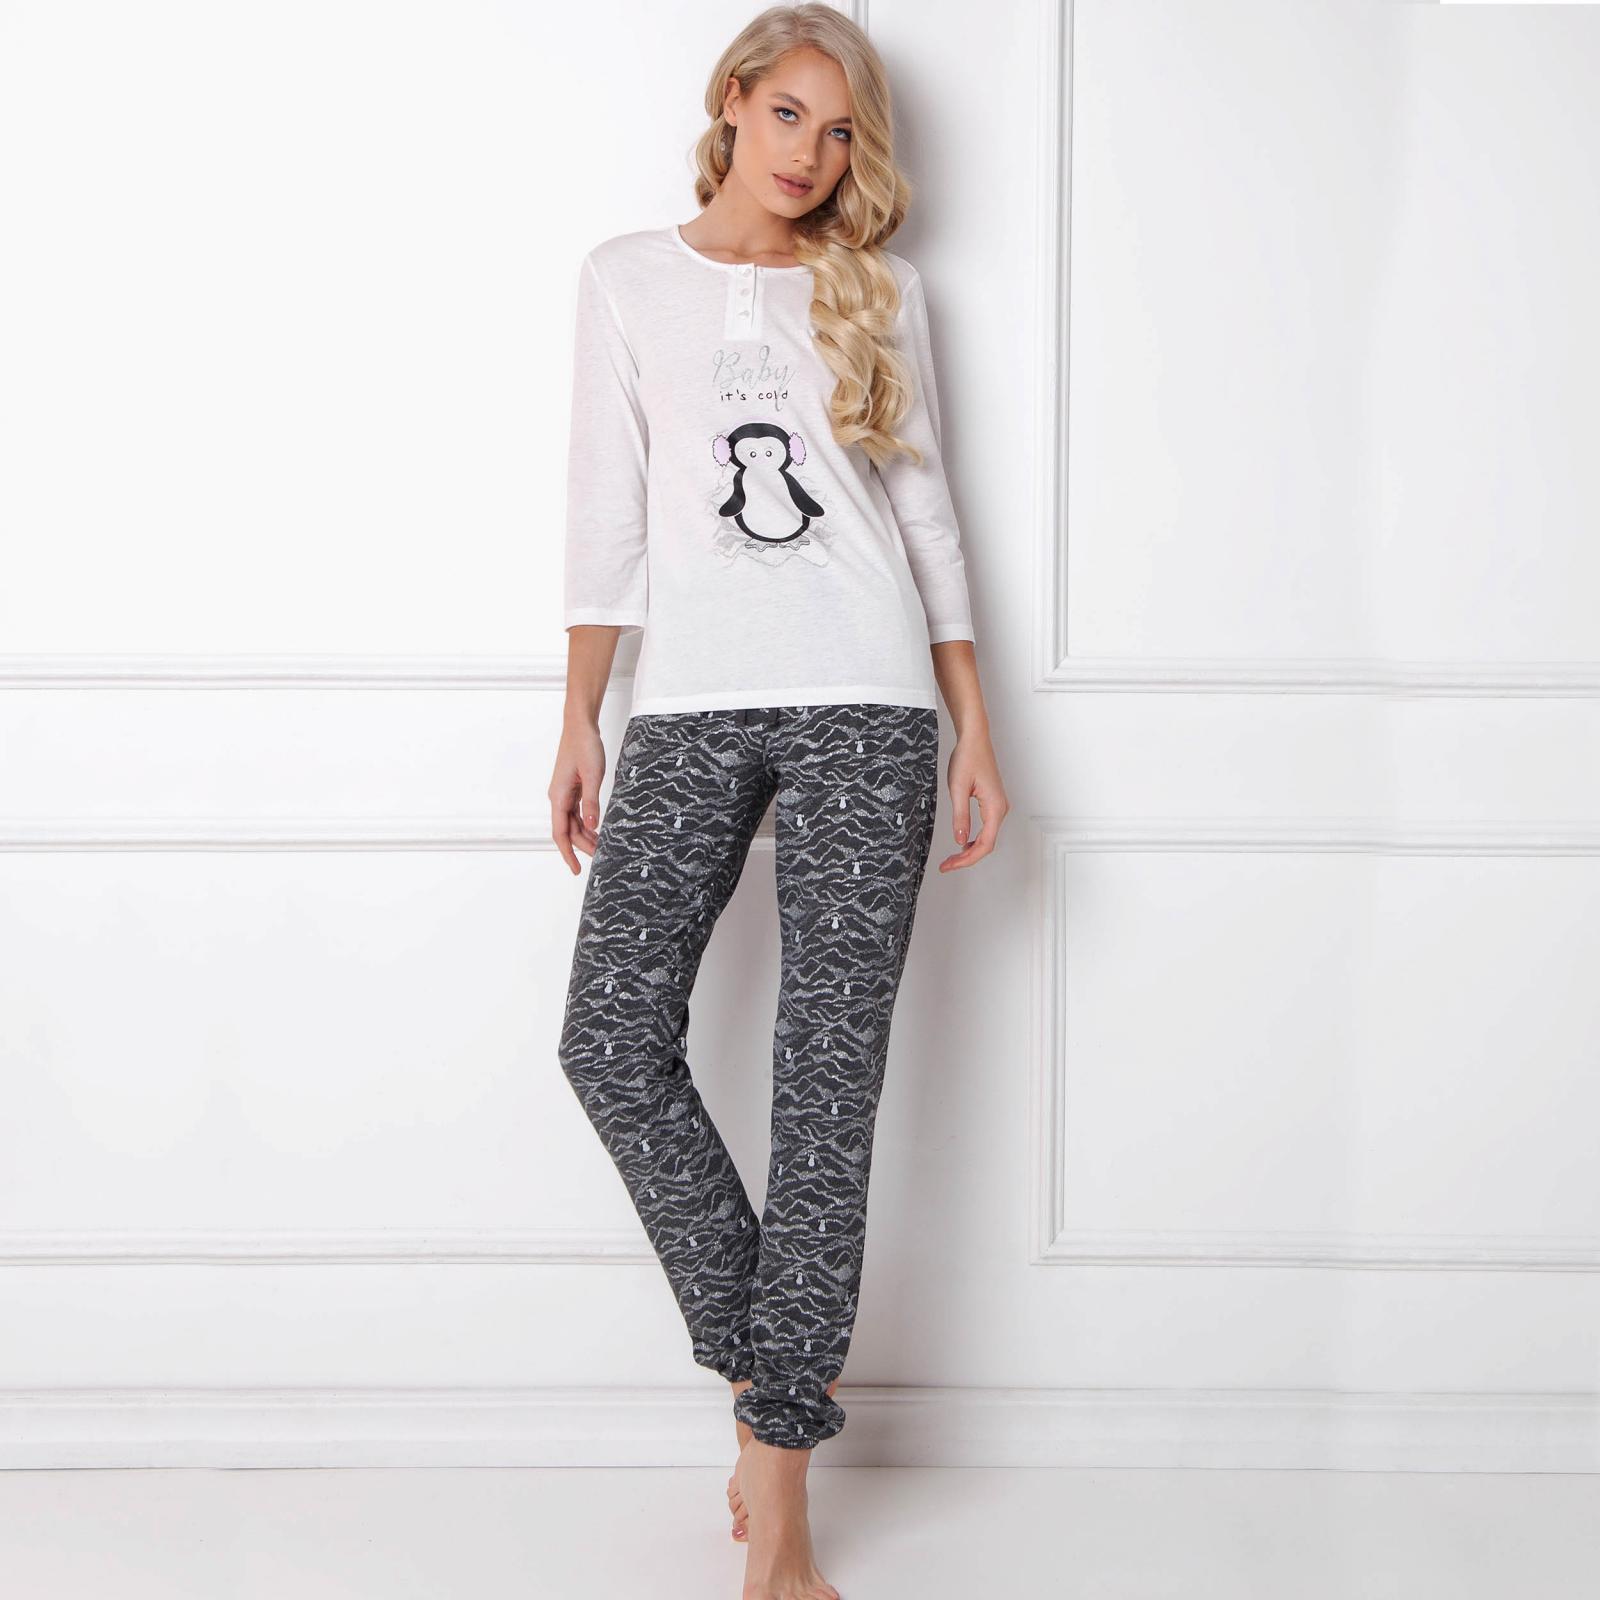 Pijamale dama Peggy Arctic 2 piese, pantaloni lungi